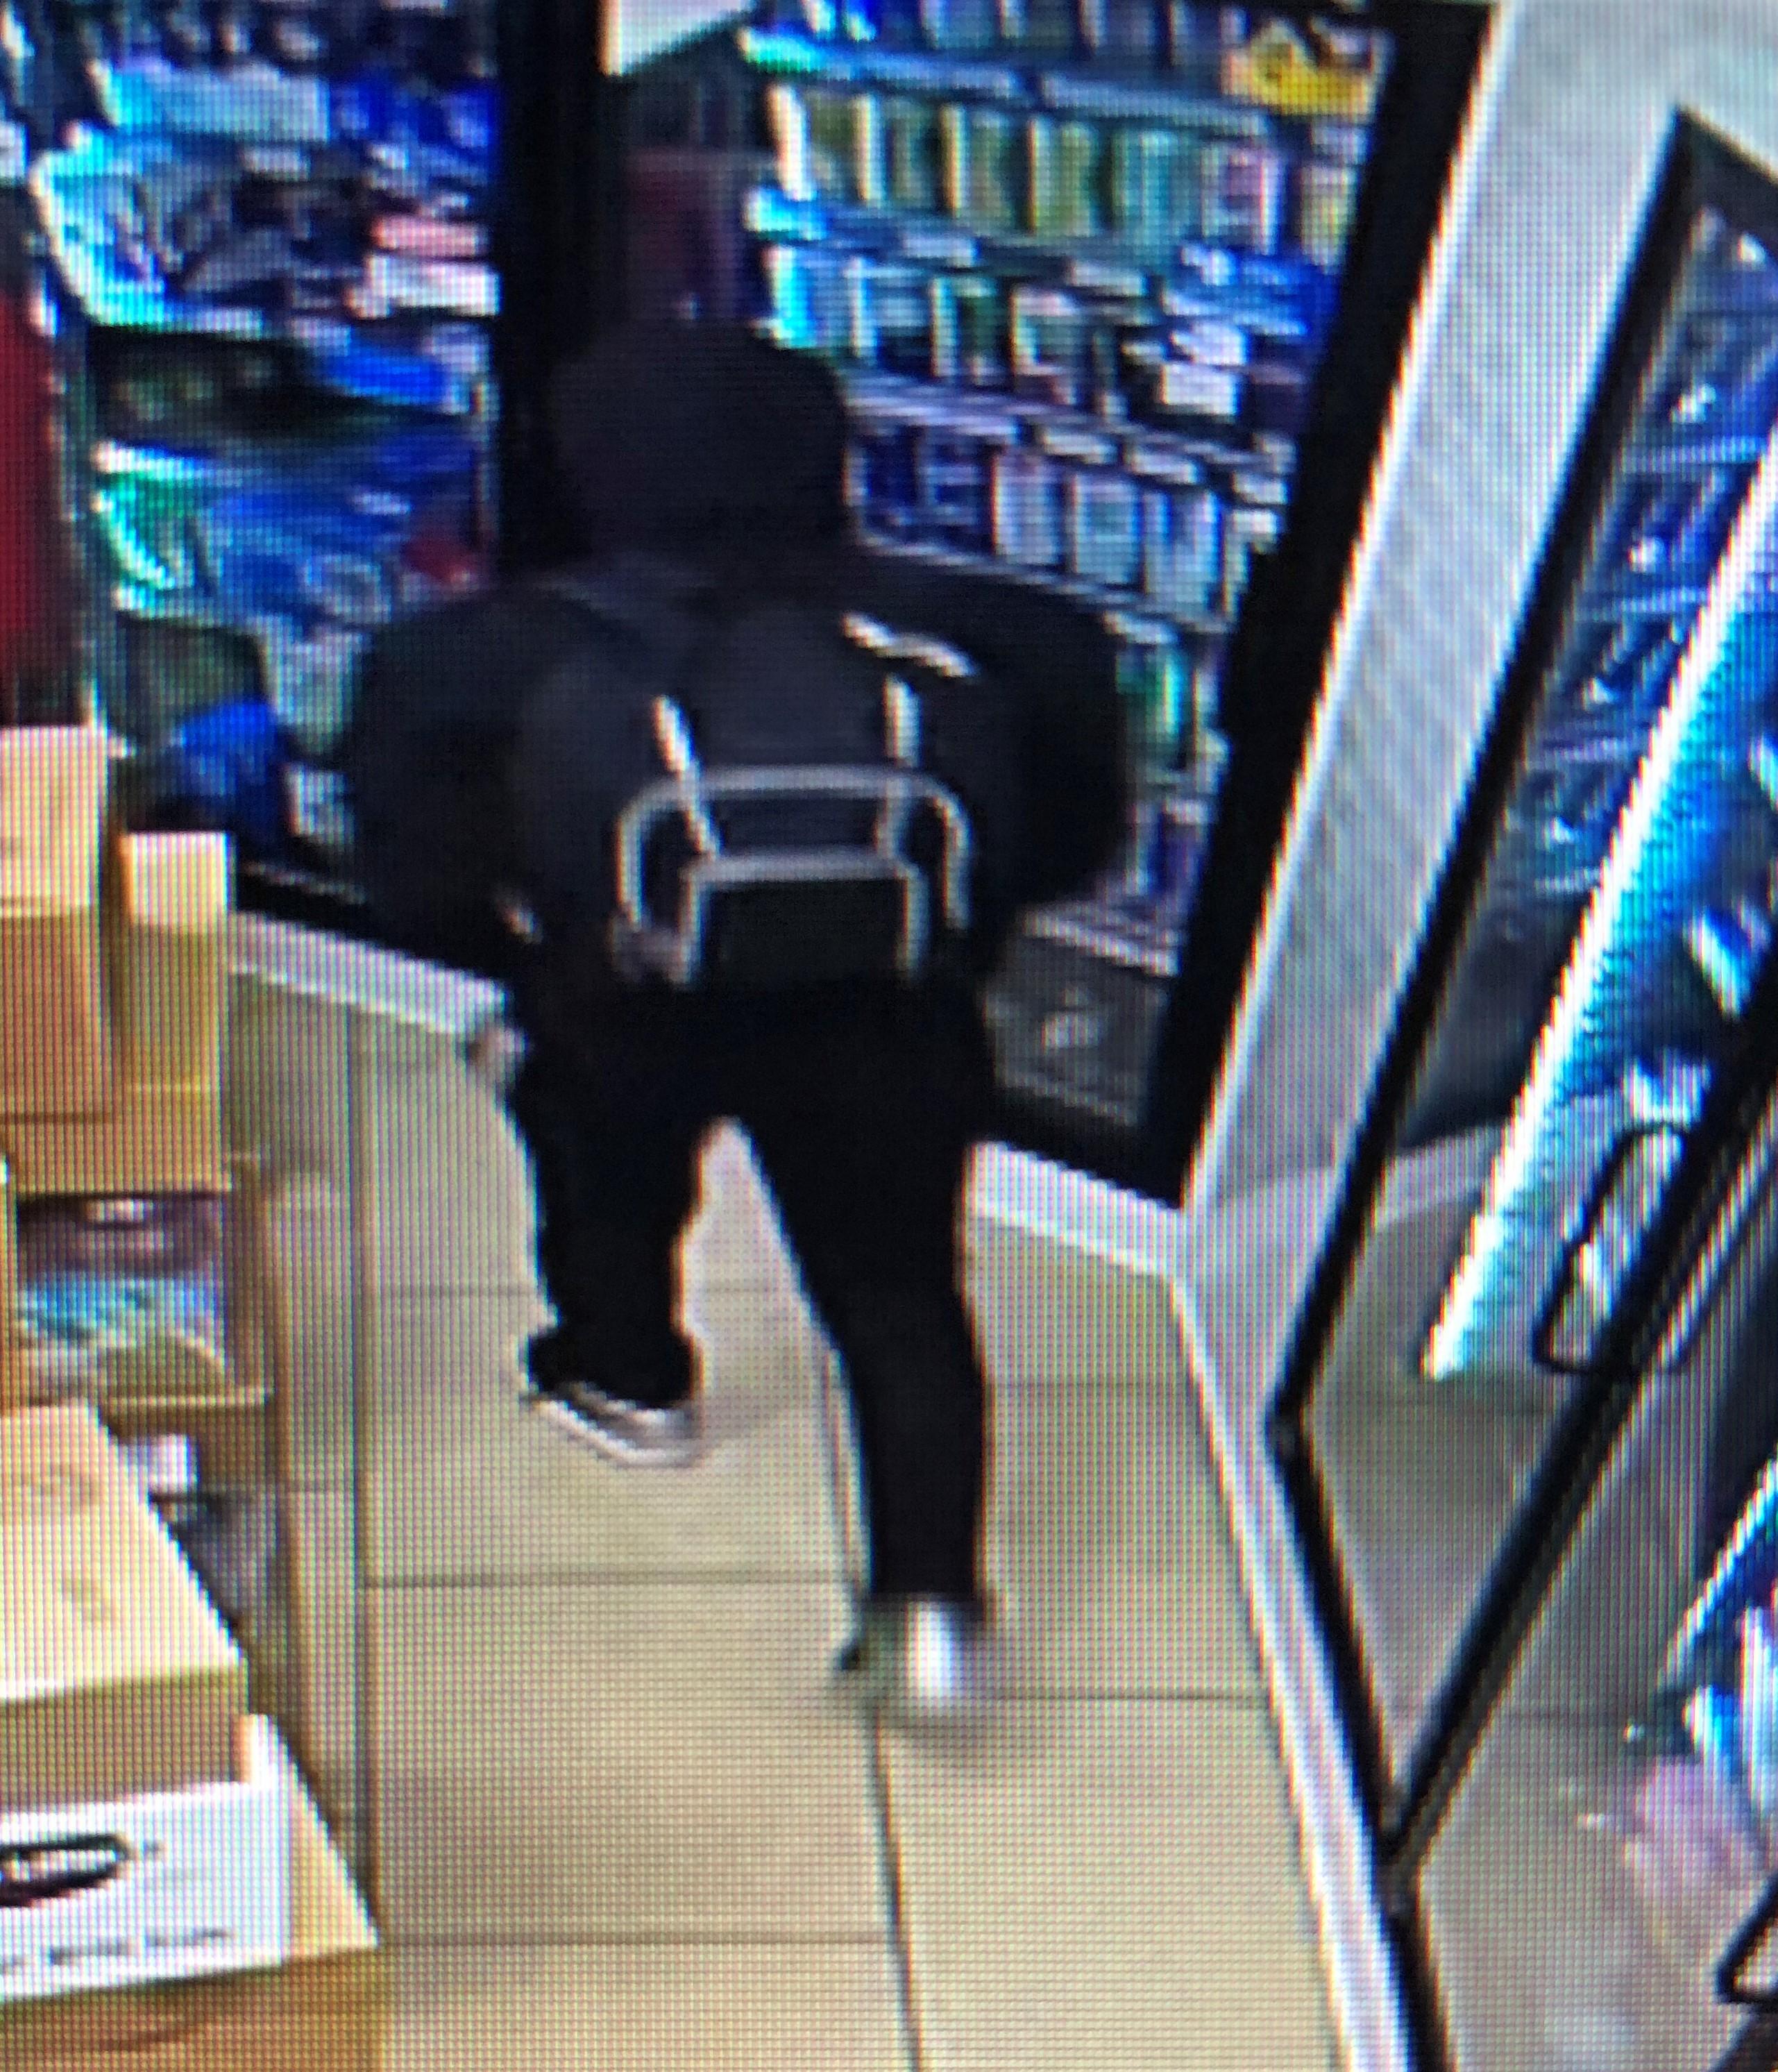 Image 3: Robbery Suspect